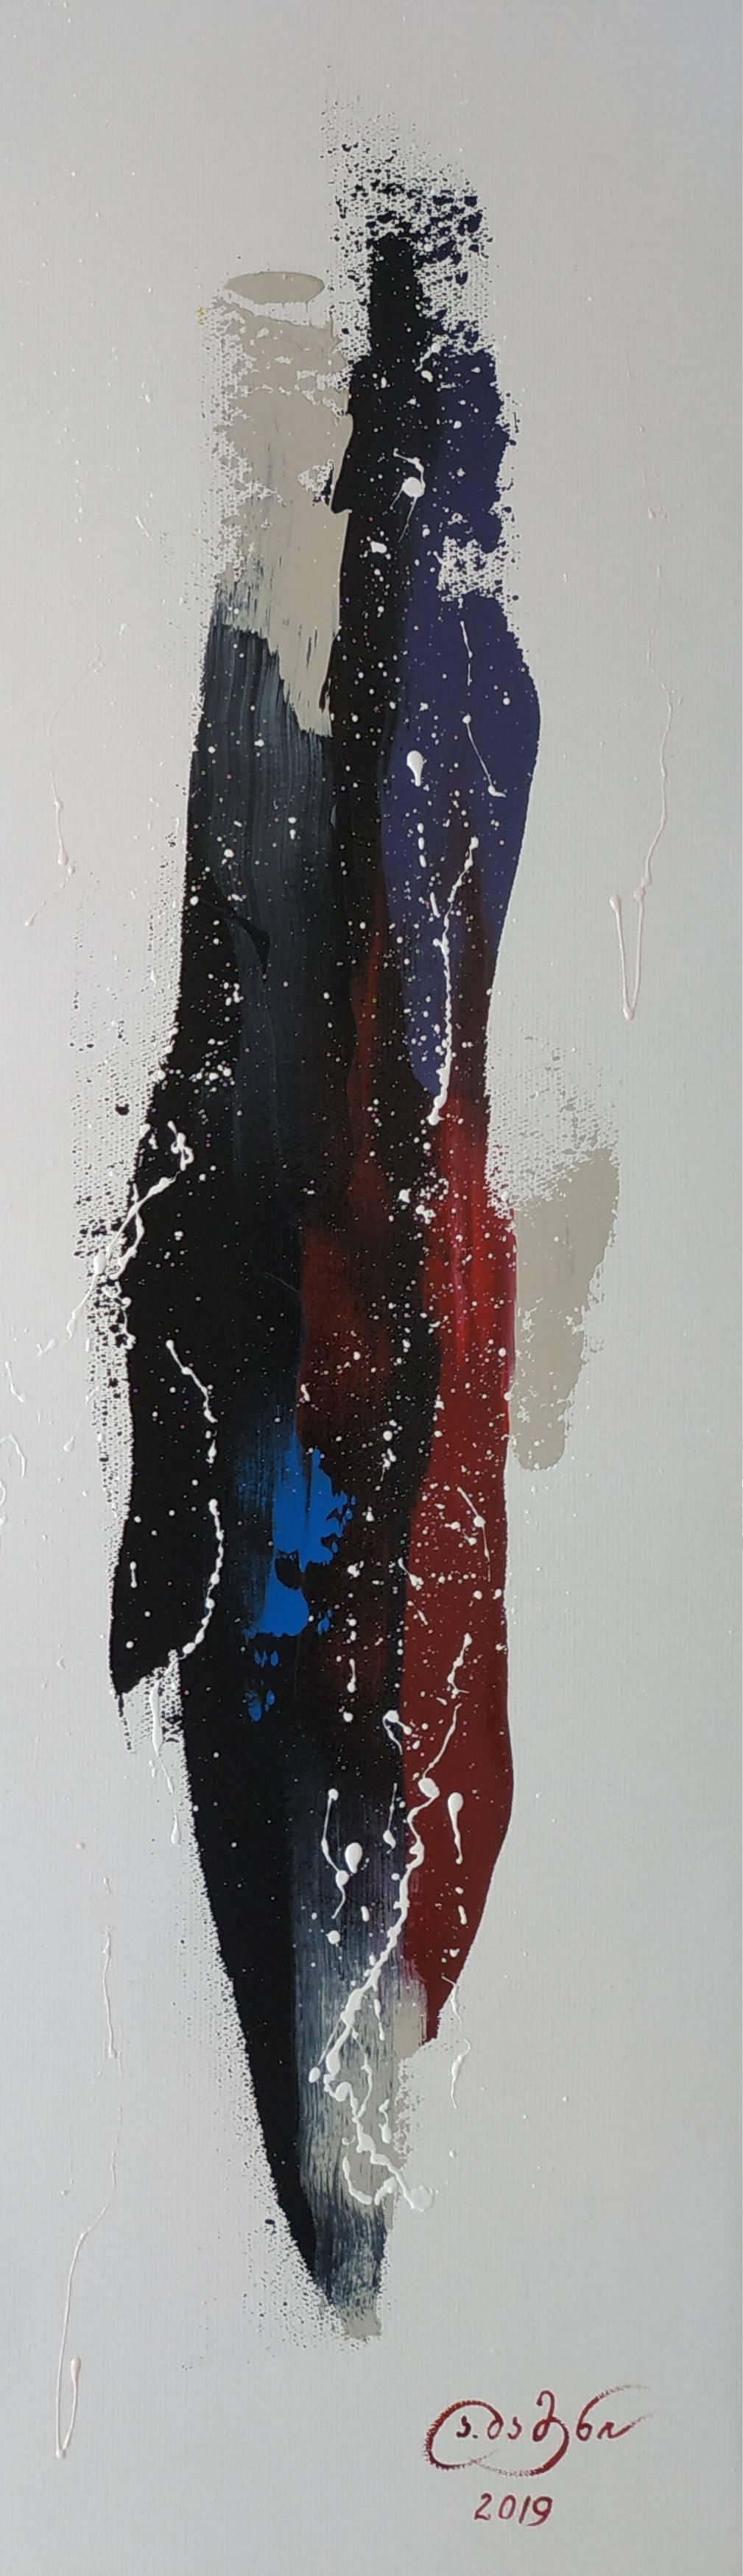 «Иллюзионист»  холст, масло «Illusionist»  oil on canvas  68x20,  2019